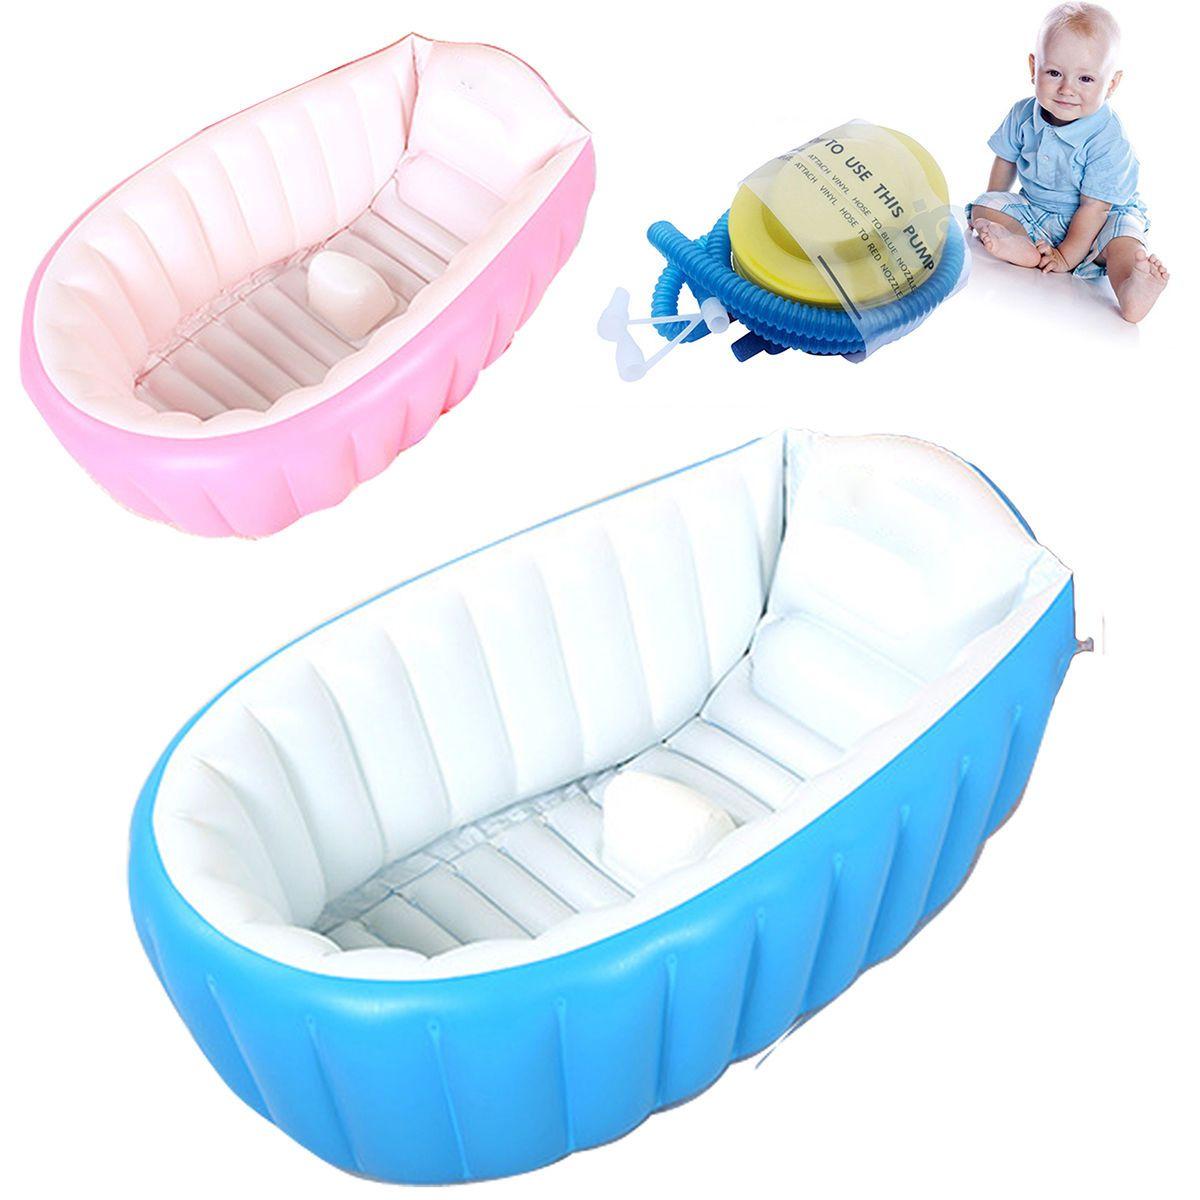 Baby Bathtubs Baby | Portable bathtub, Bath tubs and Bathtubs